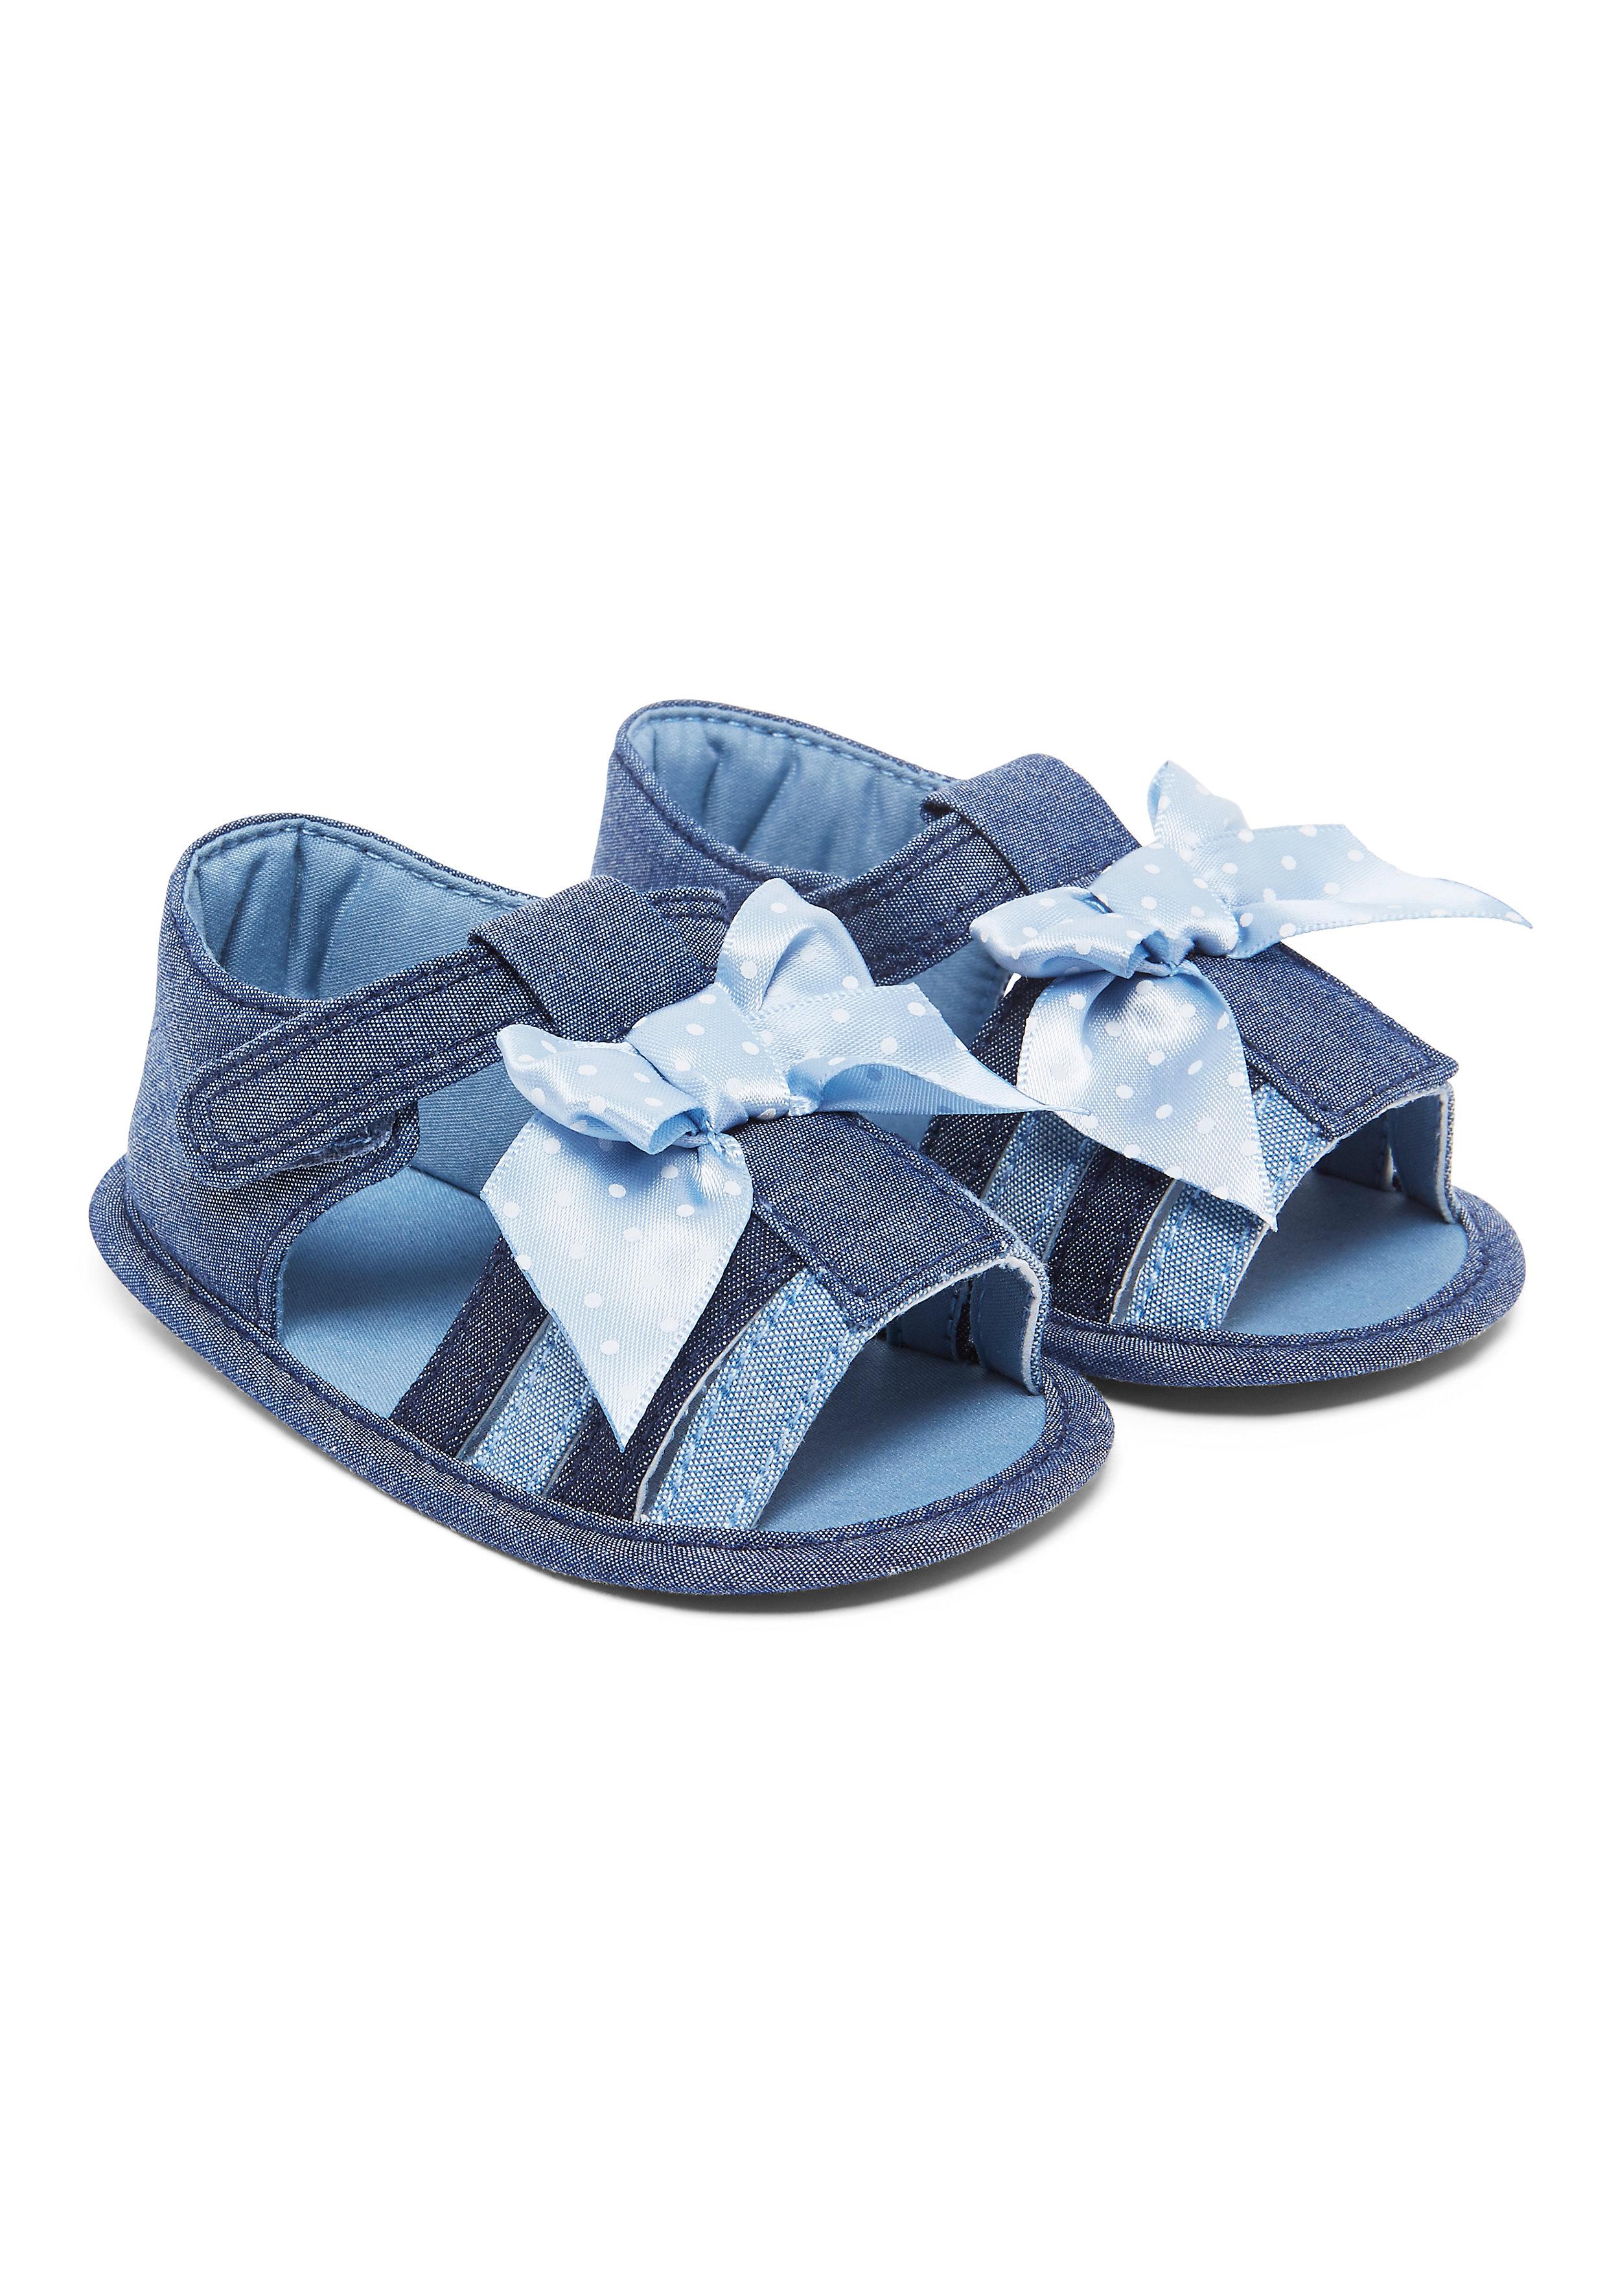 Mothercare | Girls Denim Sandals - Blue